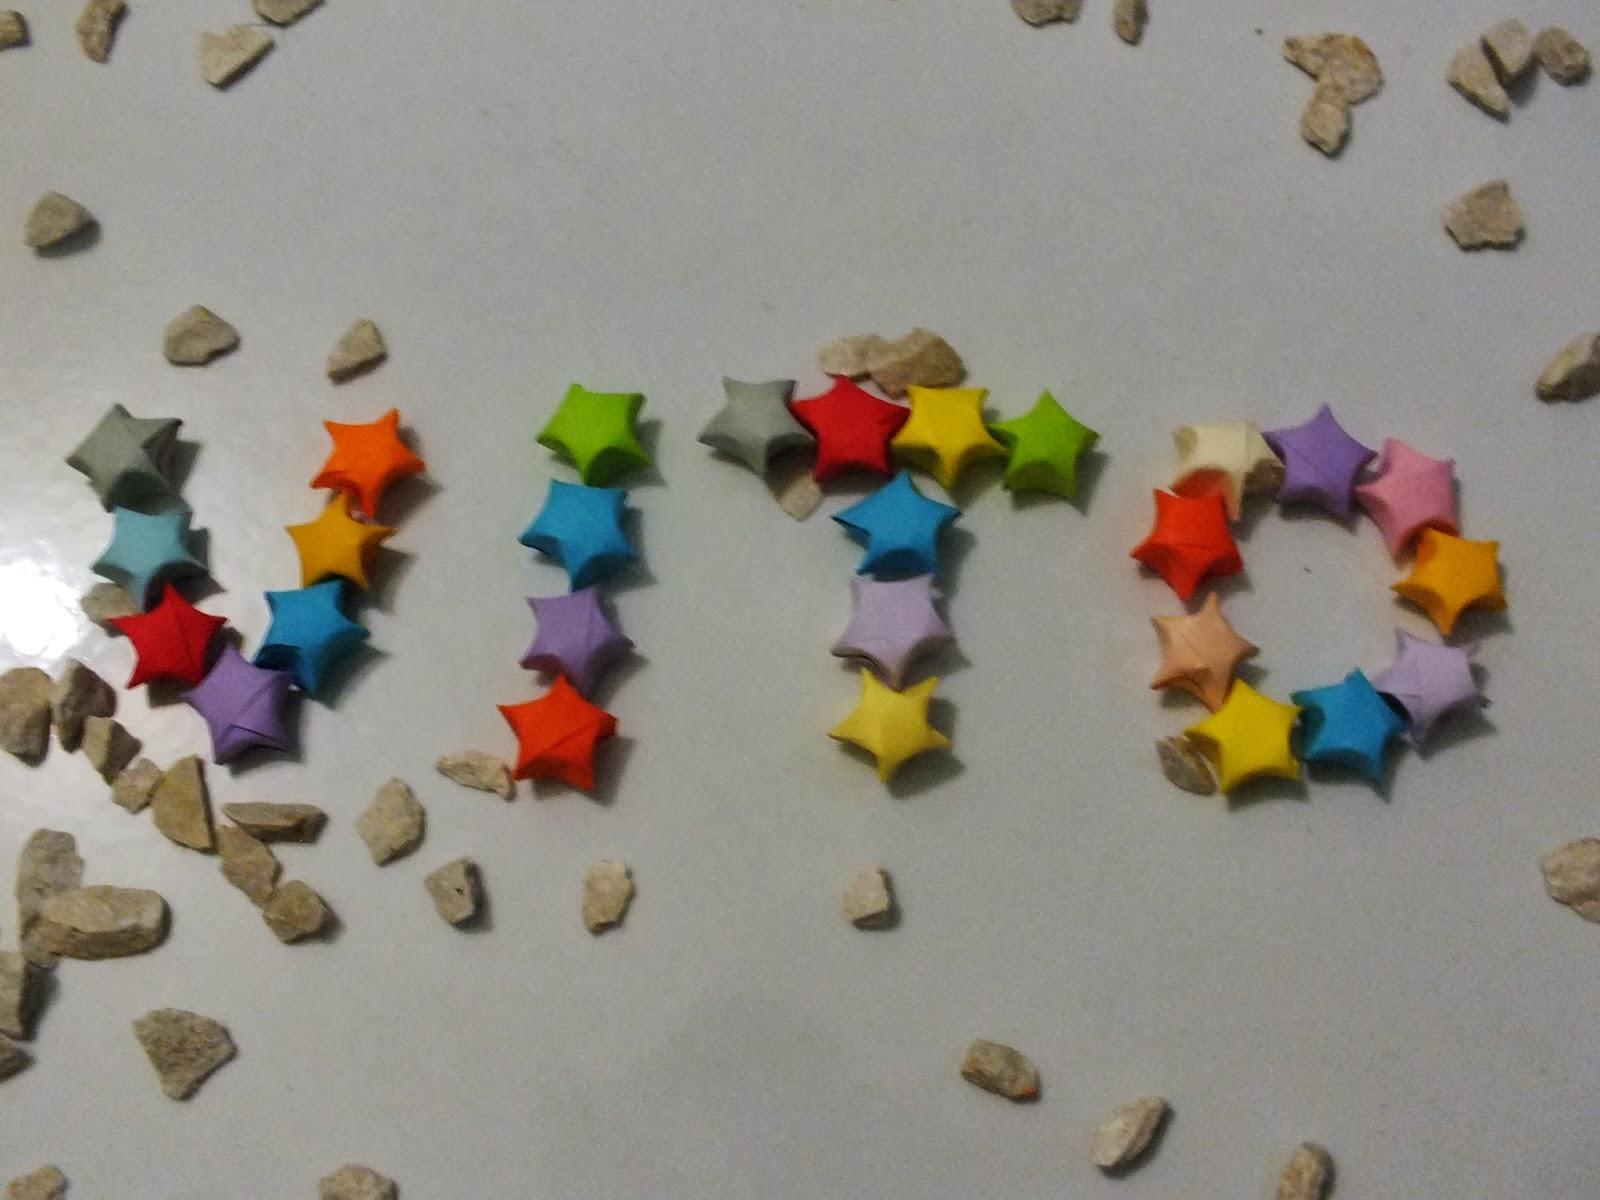 DIY Origami Lucky Stars Chain | a crafty tutorial! – adventuring ... | 1200x1600